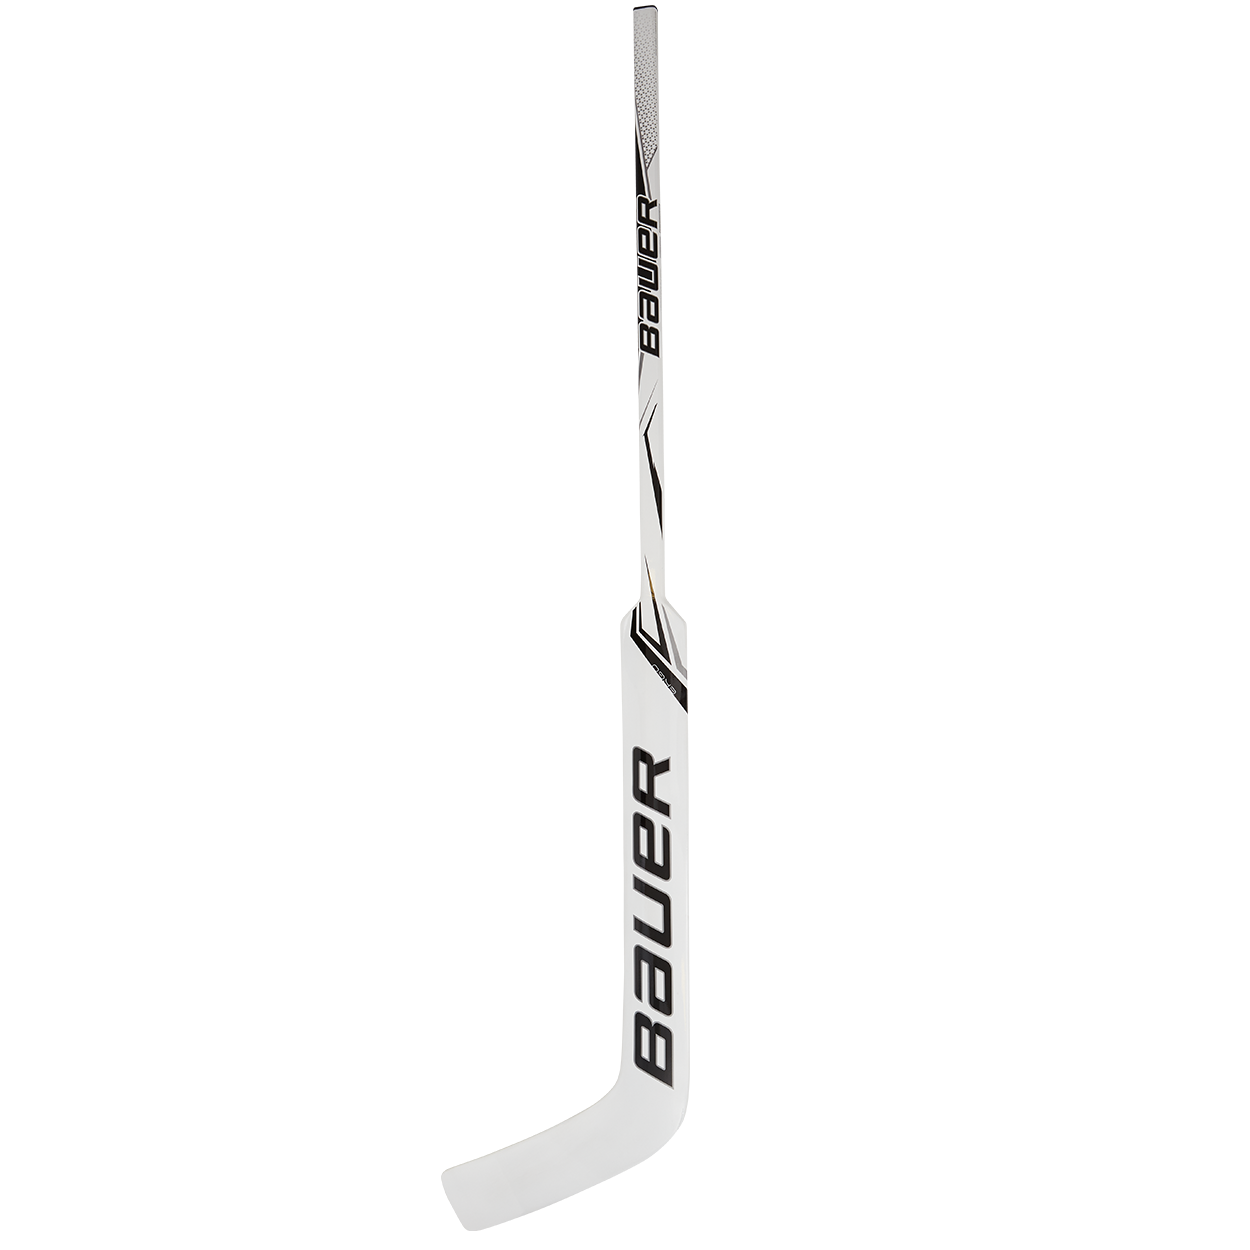 GSX PRODIGY Goal Stick,,Размер M